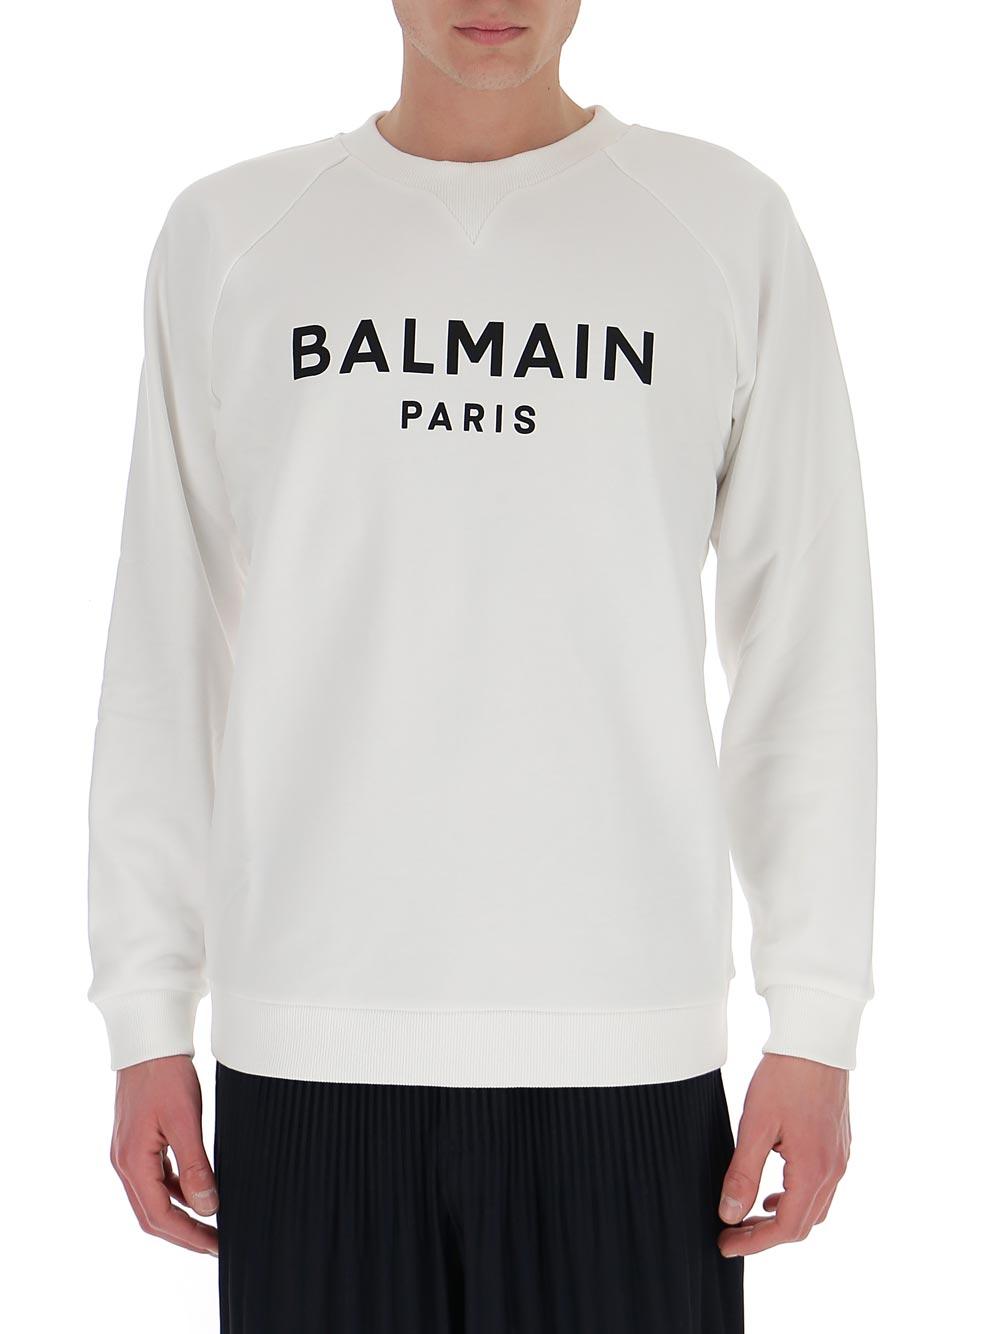 Balmain 徽标卫衣 In White